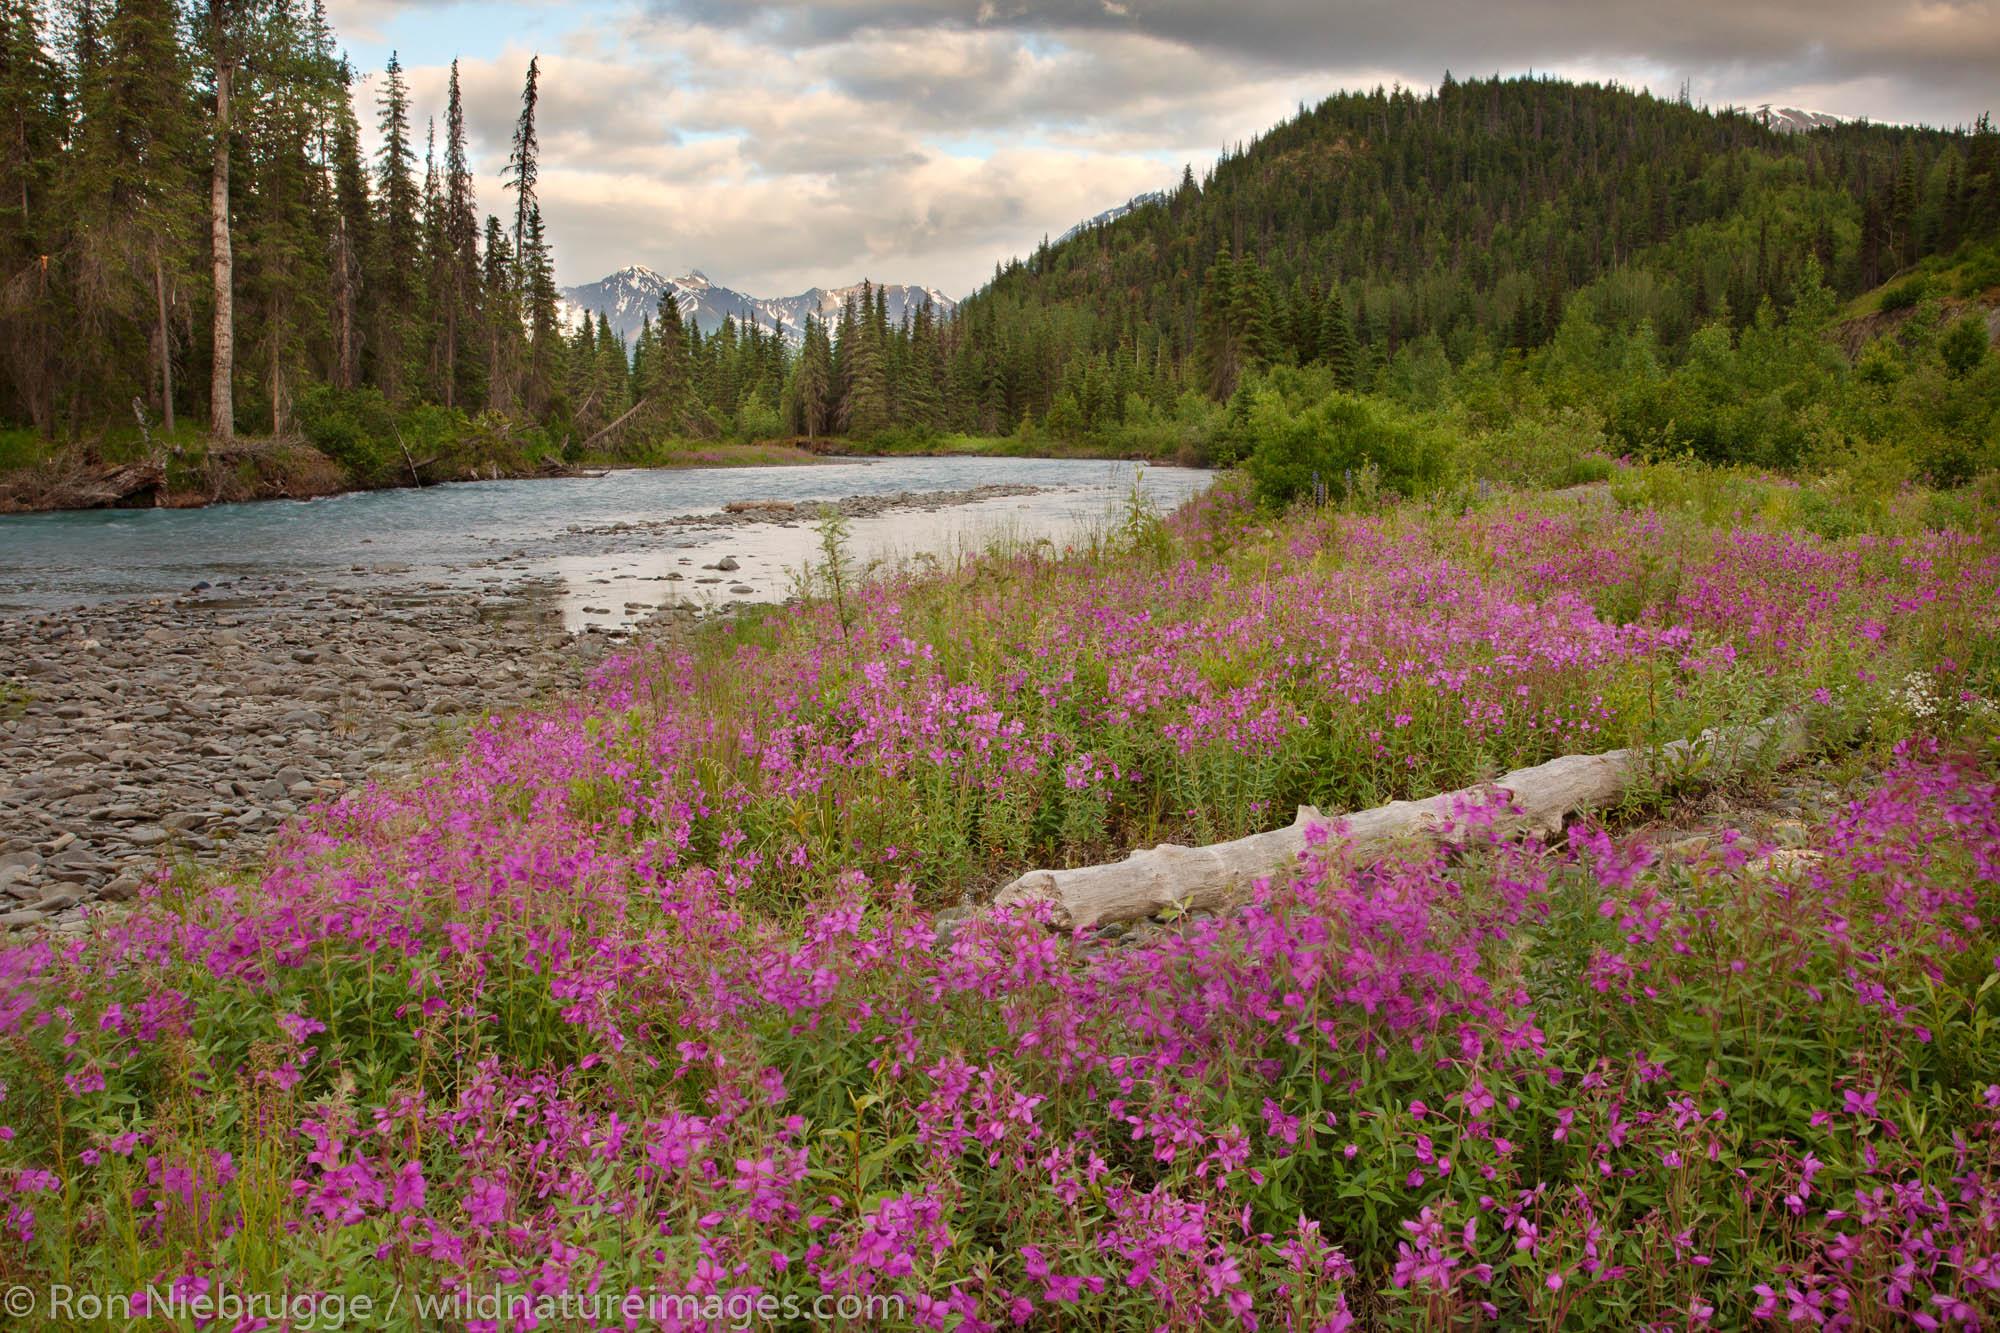 Fireweed along Six Mile Creek, Chugach National Forest, Alaska.